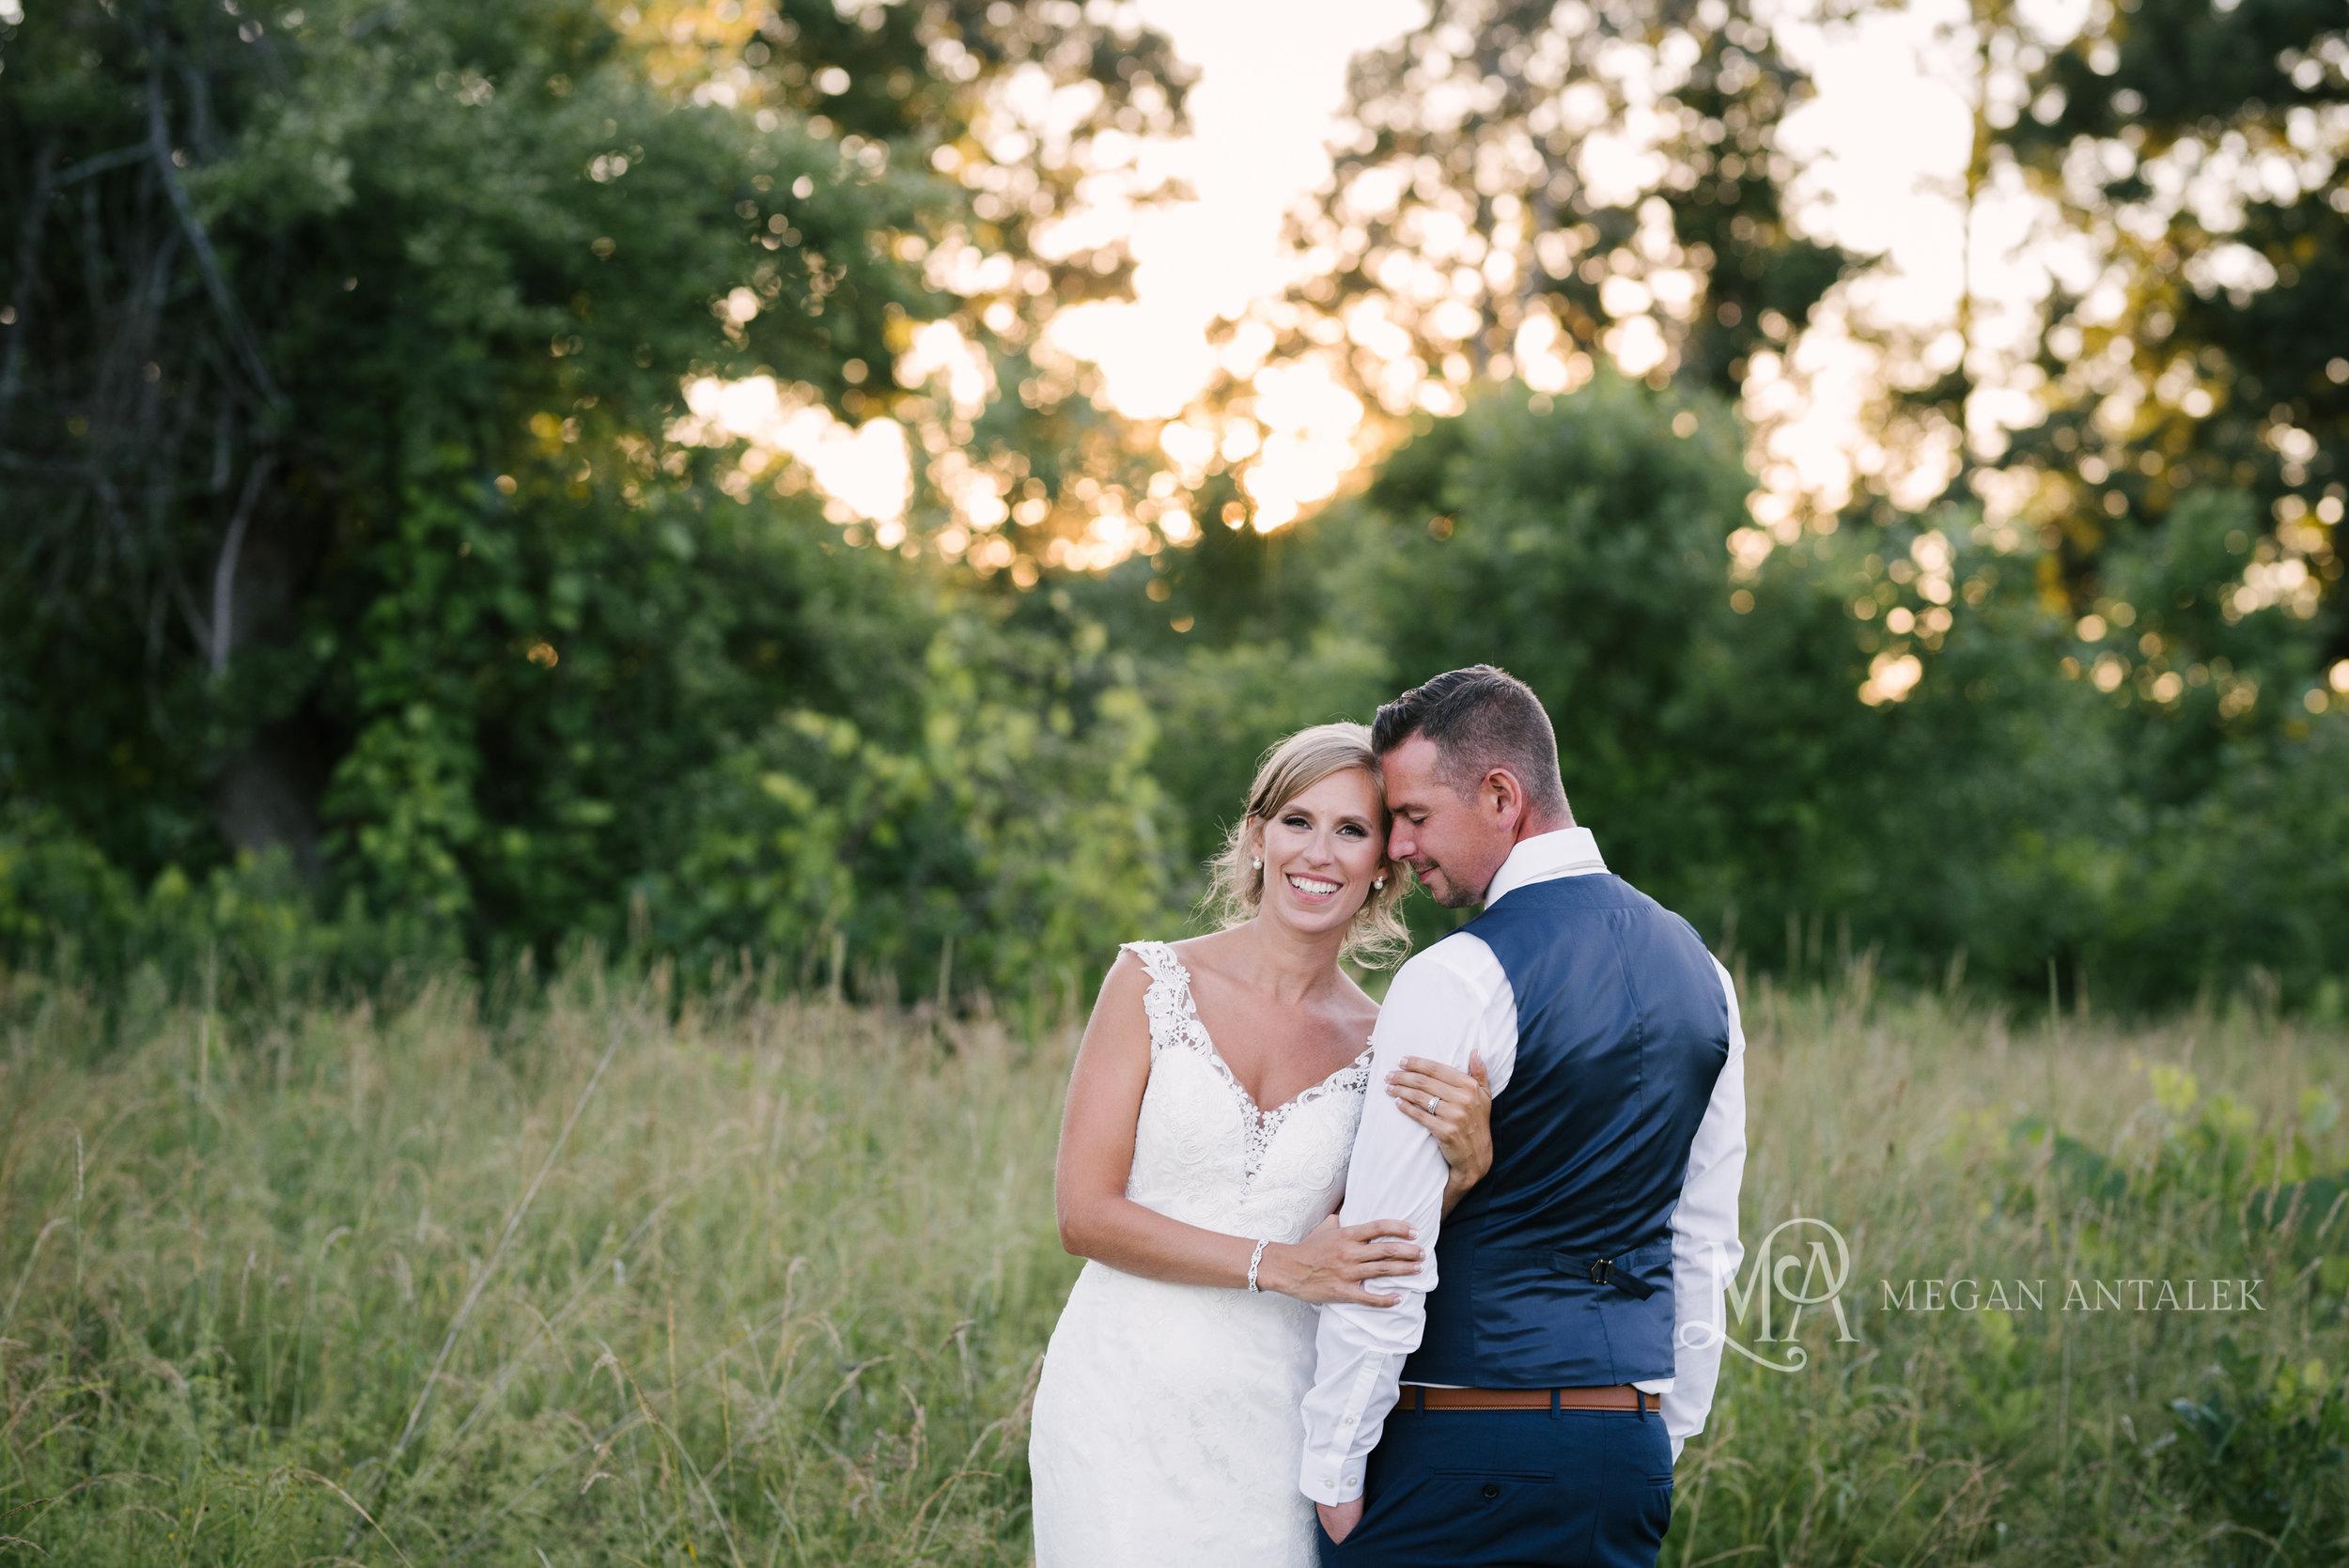 cobblestone-wedding-barn-rochester-photography-49.jpg